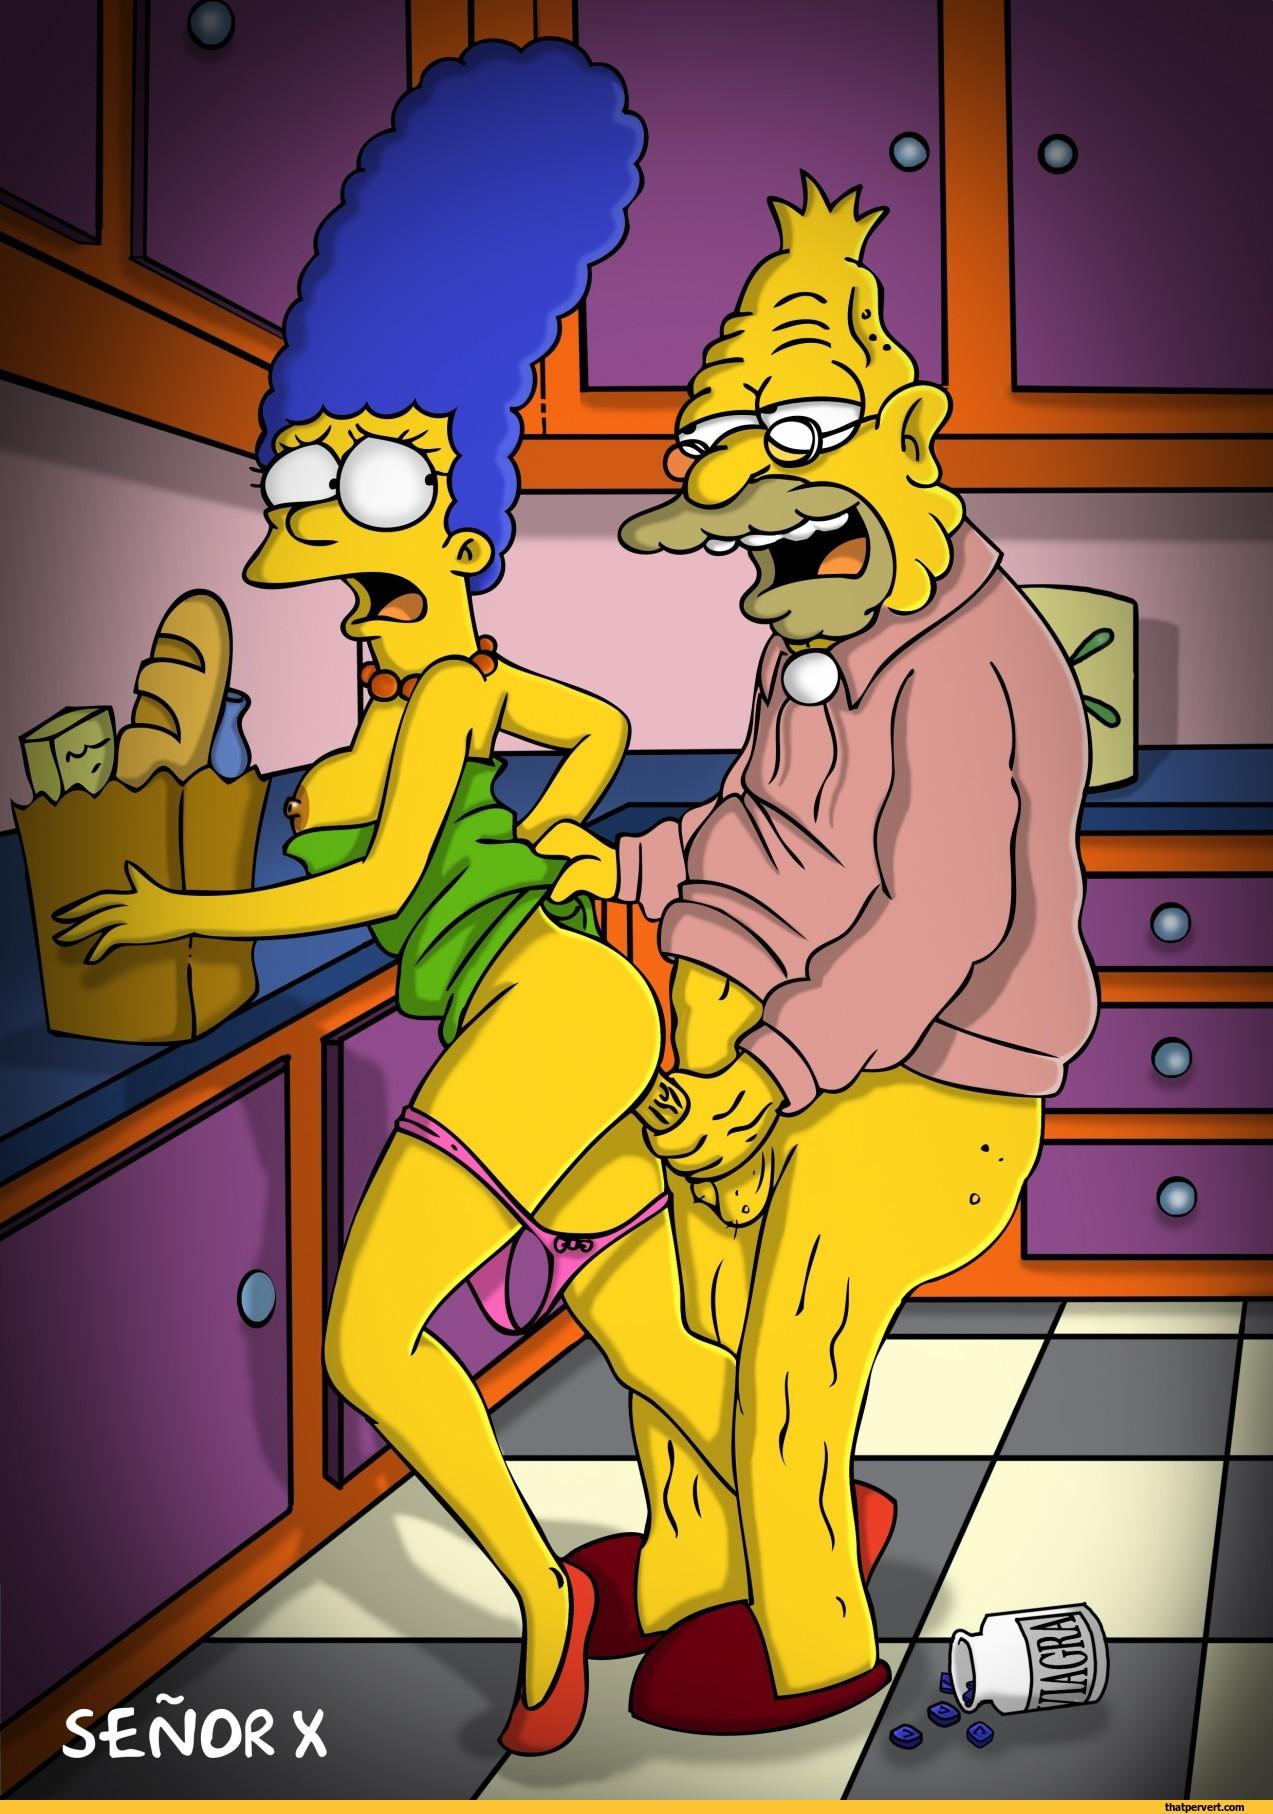 Abuelo Porno abuelo simpson follando con marge en la cocina simpson porno